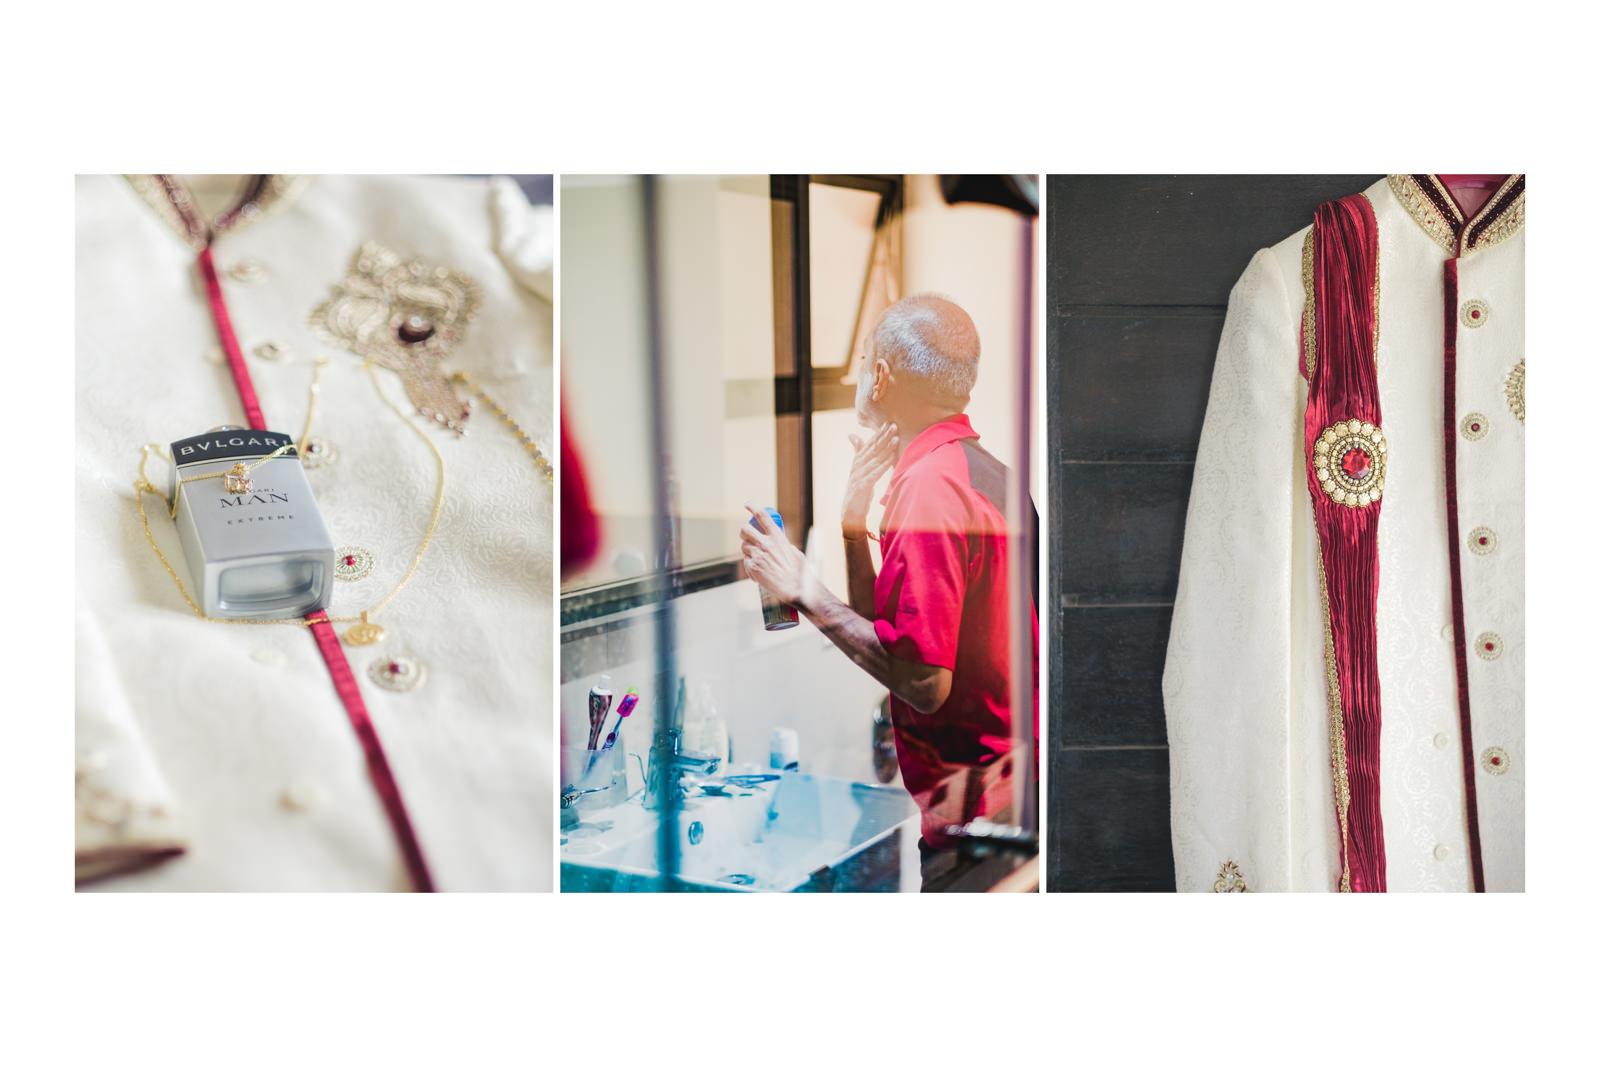 umhlanga wedding photography rbadal getting ready